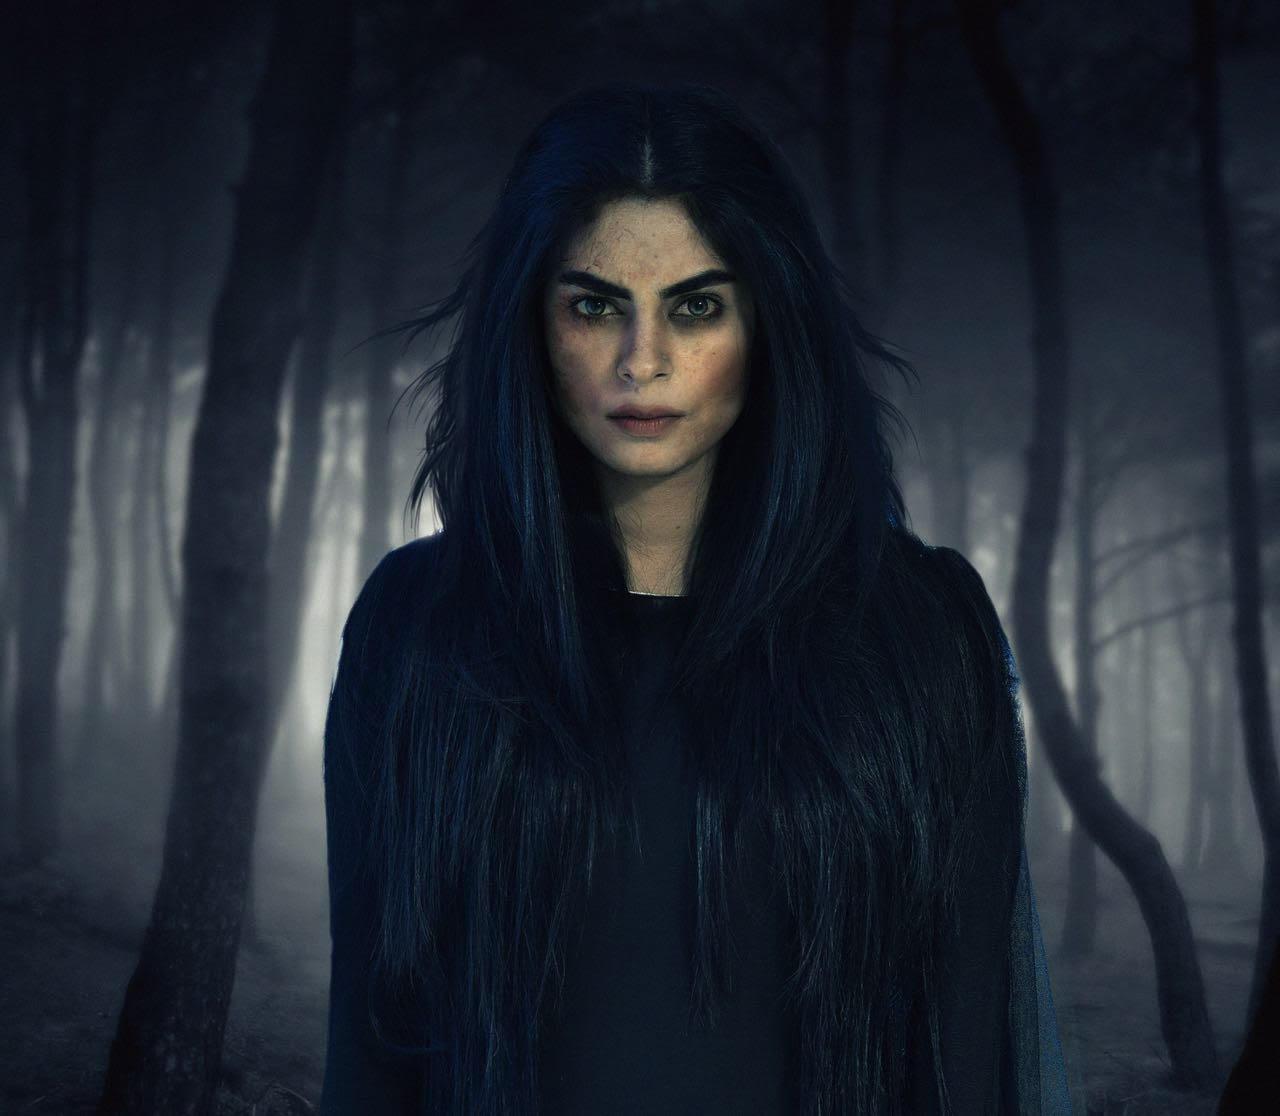 bellapur ki dayan the pakistani series that will haunt you in 2018